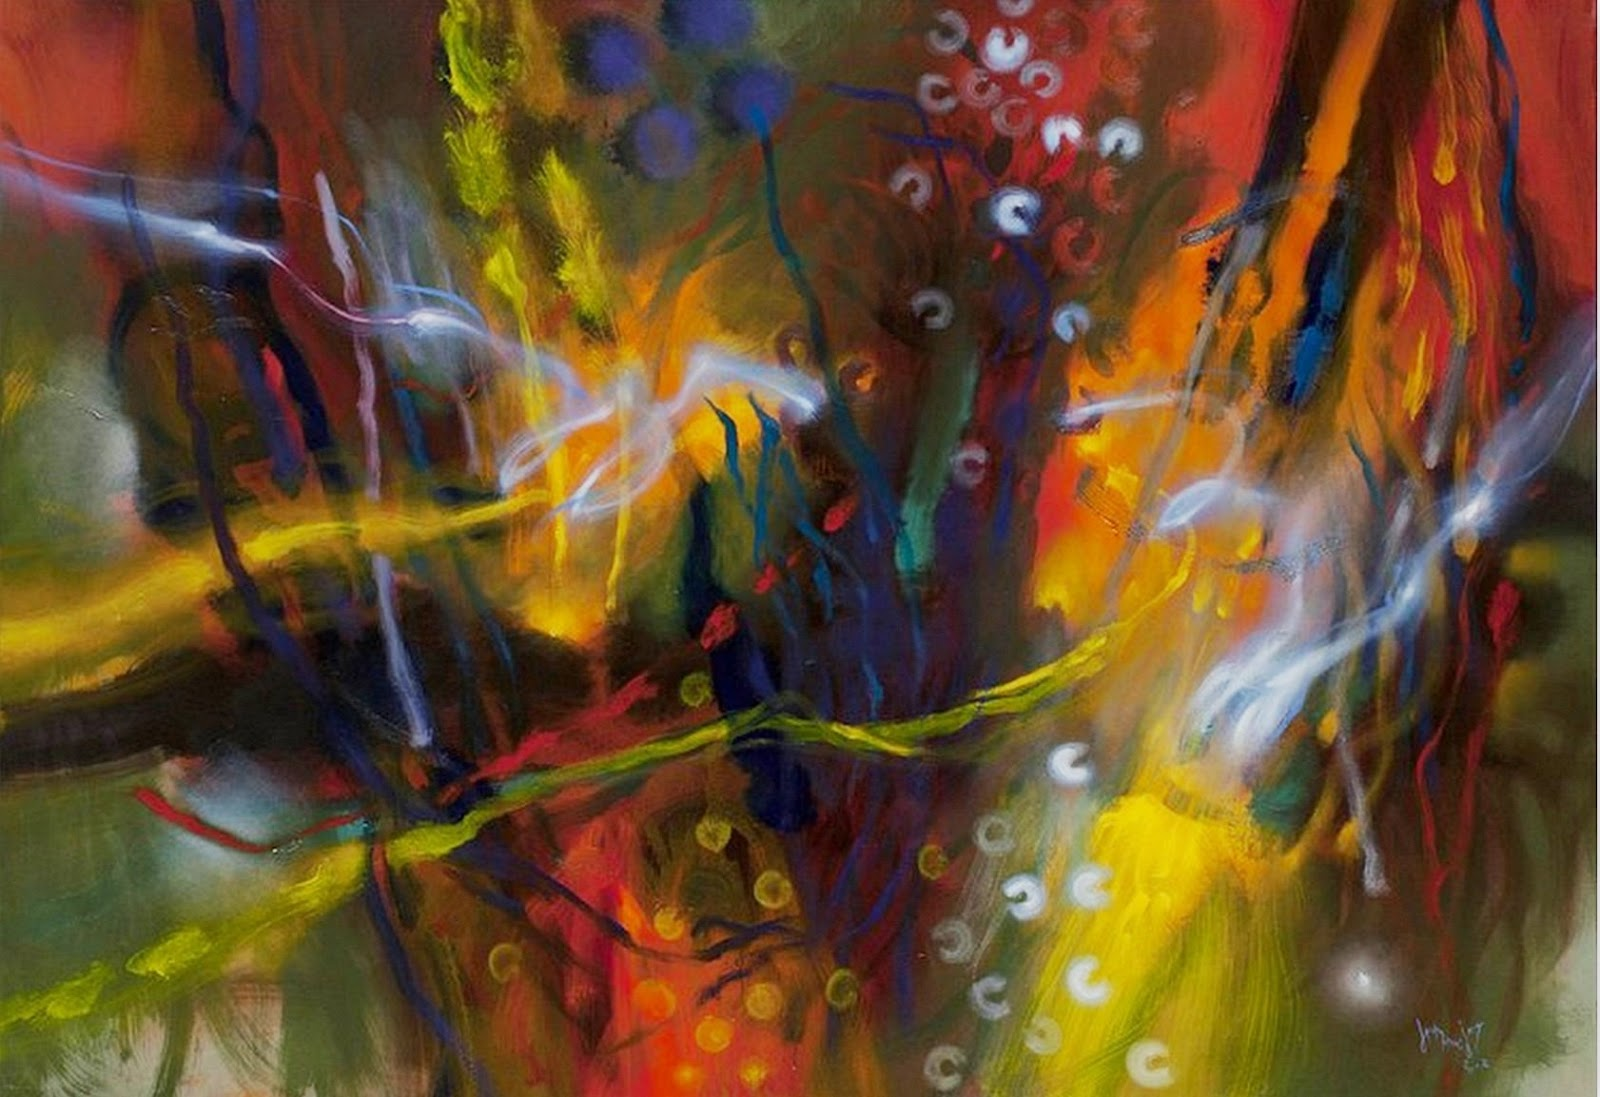 Arte pinturas leo cuadros decorativos modernos - Pintura cuadros modernos ...